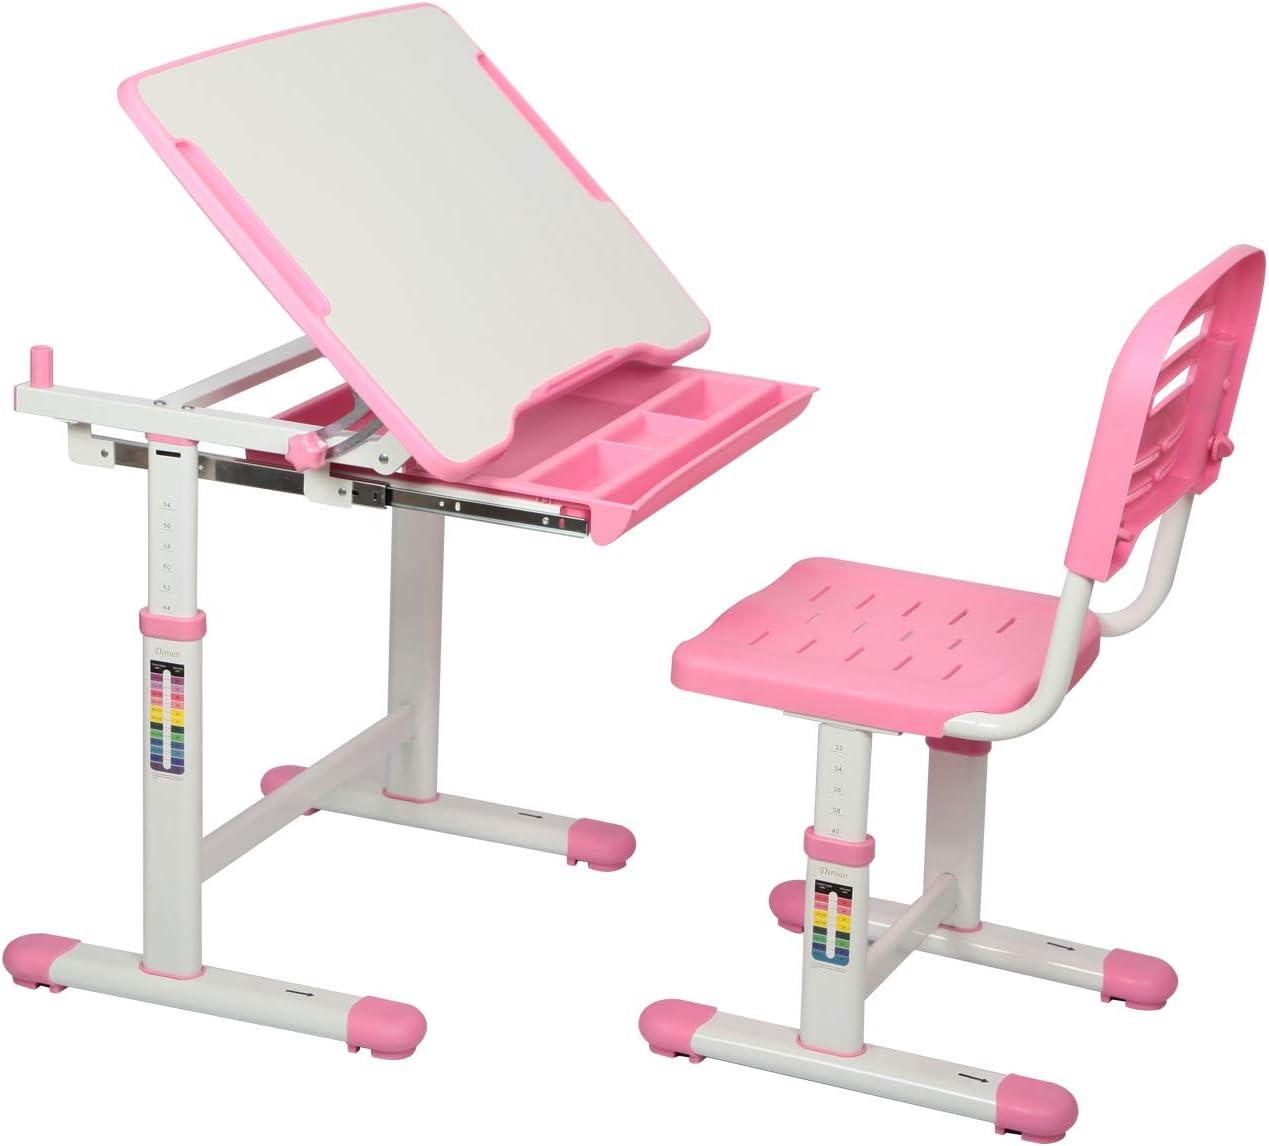 Diroan Kids Multifunctional Desk and Chair Set Height Adjustable Children School Study Desk with Tilt Desktop Pink Metal Hook and Storage Drawer for Boys Girls